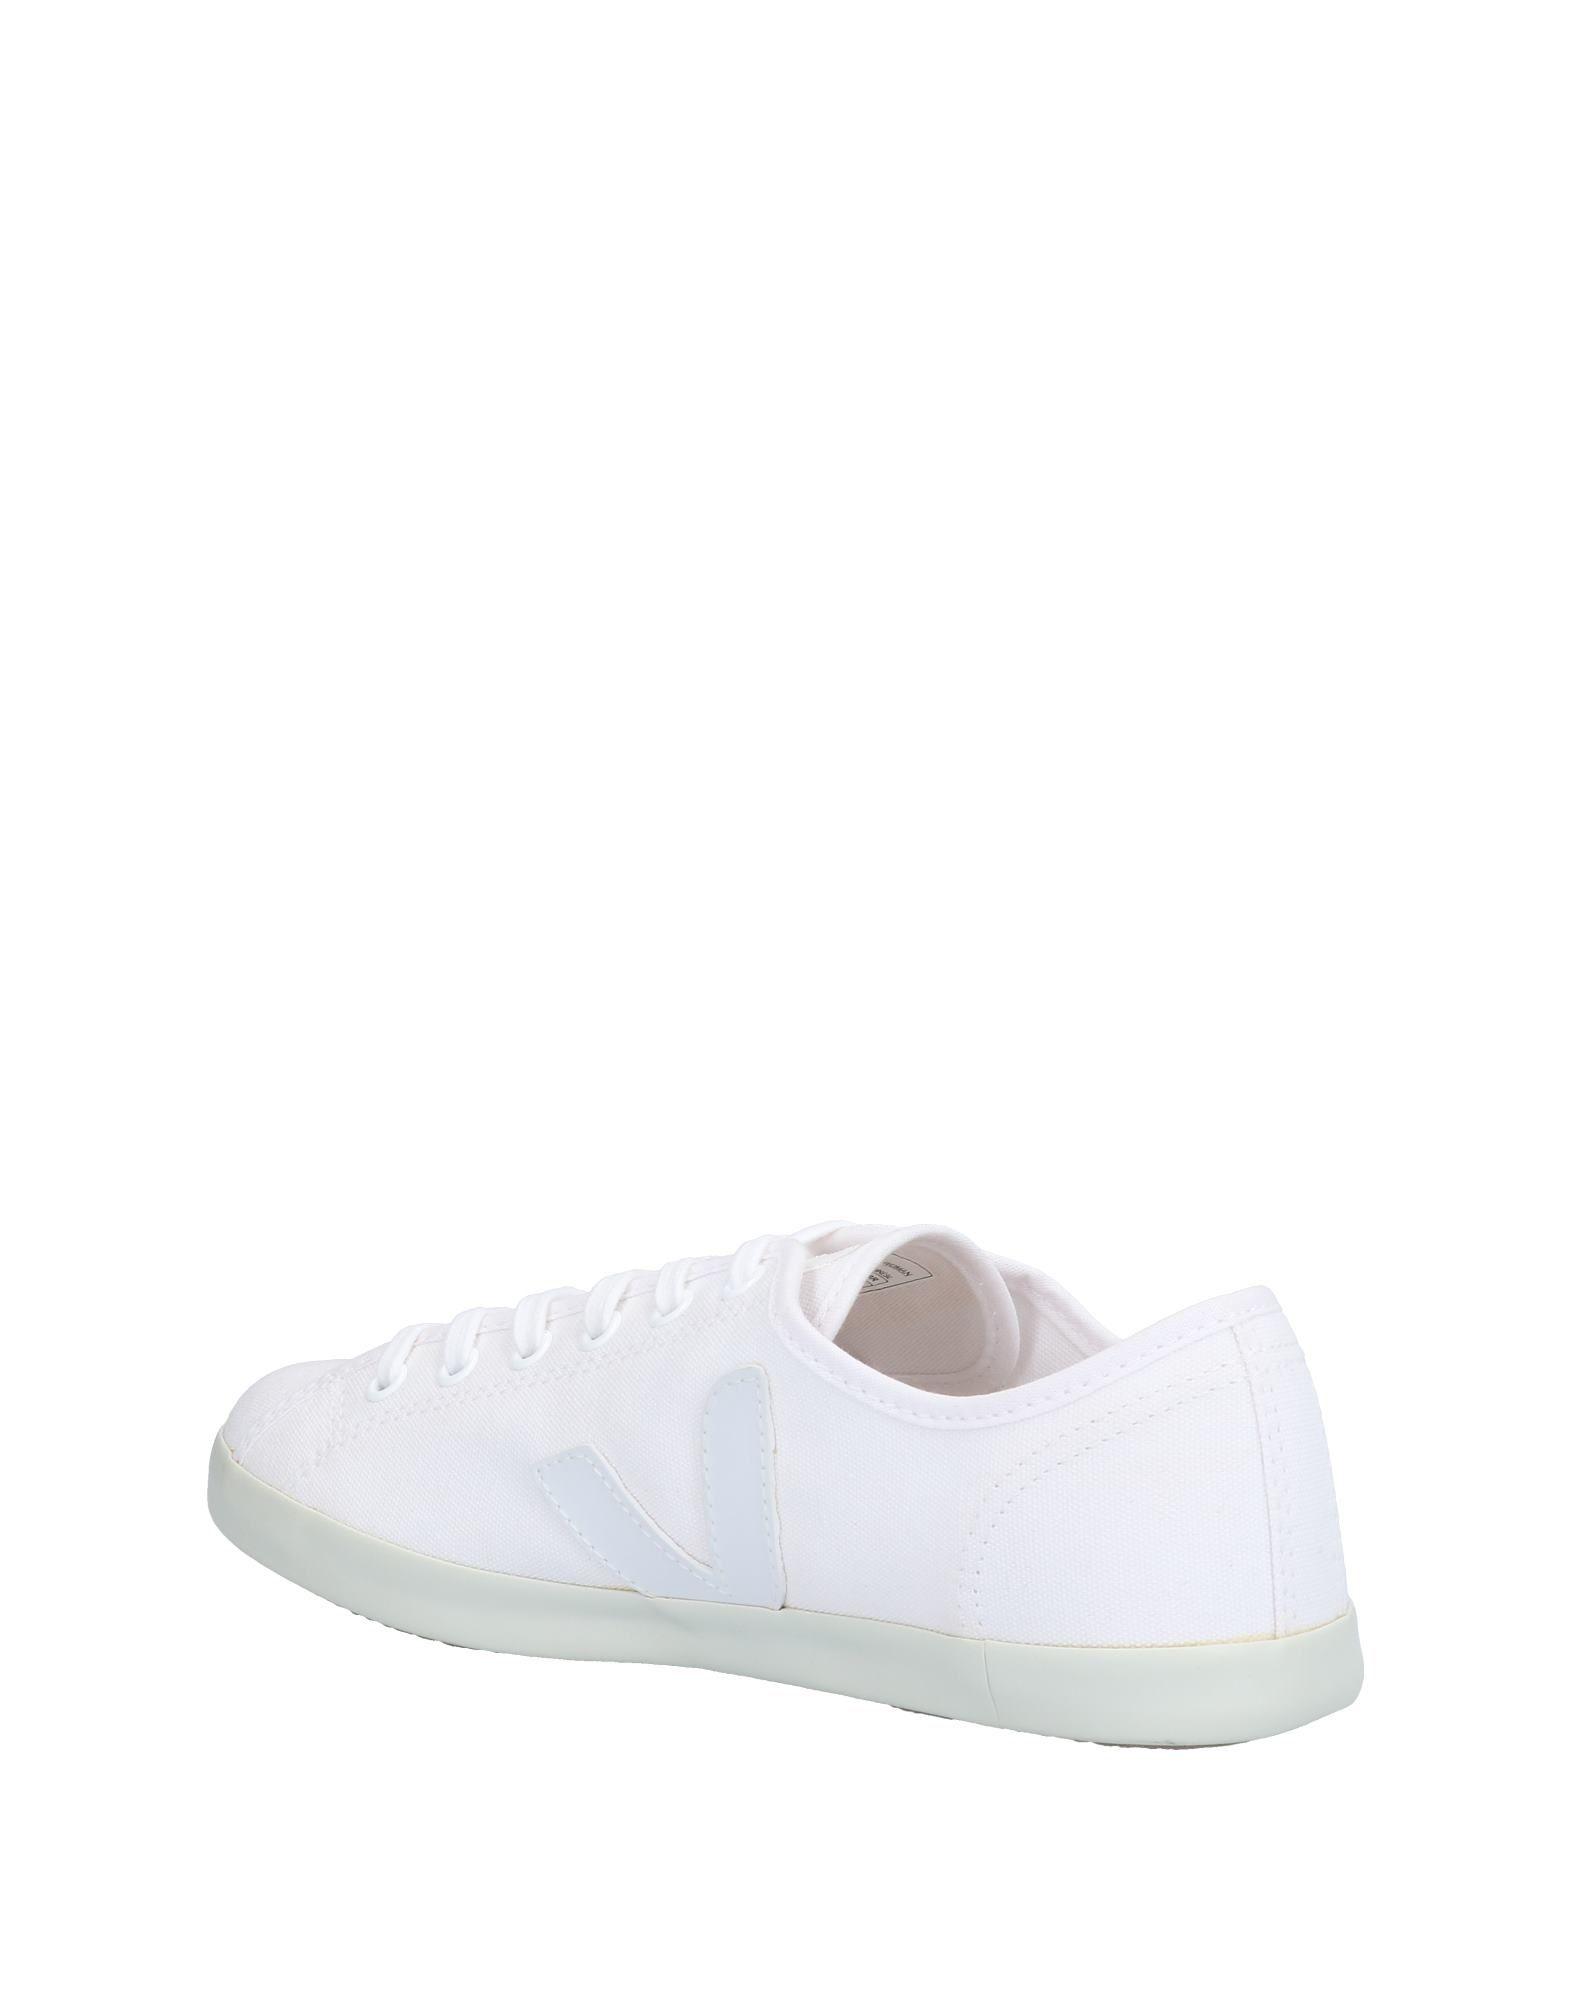 Veja 11498400WQ Sneakers Damen  11498400WQ Veja Gute Qualität beliebte Schuhe b03ef5